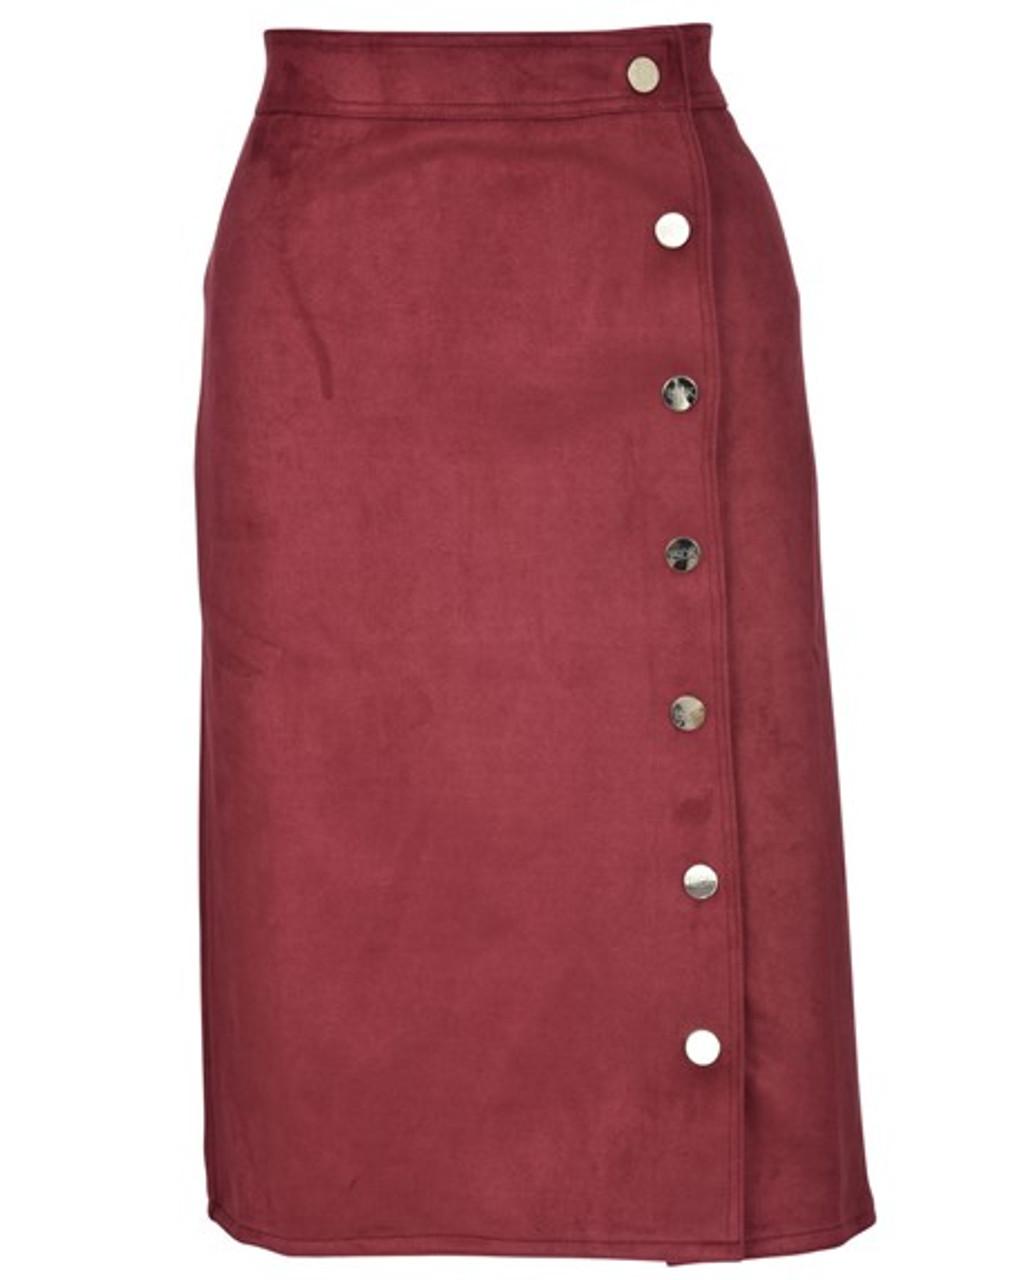 BGDK Ladies Suede Straight Skirt